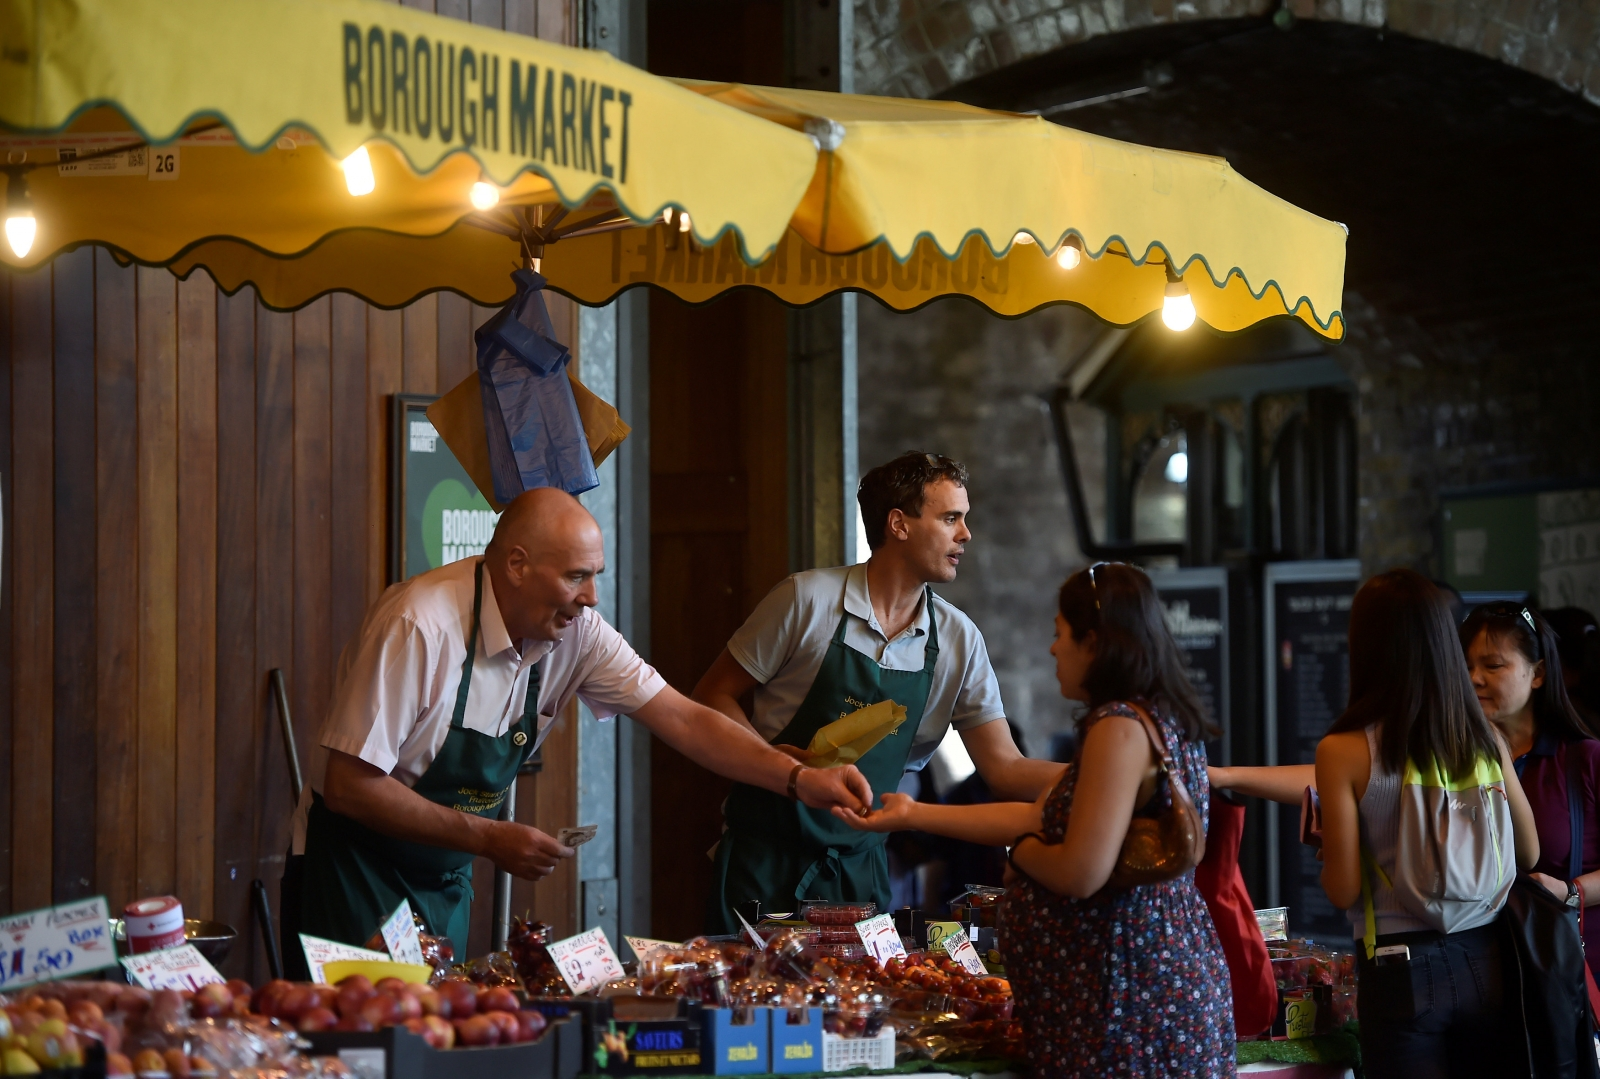 Borough Market reopens after London Bridge attack